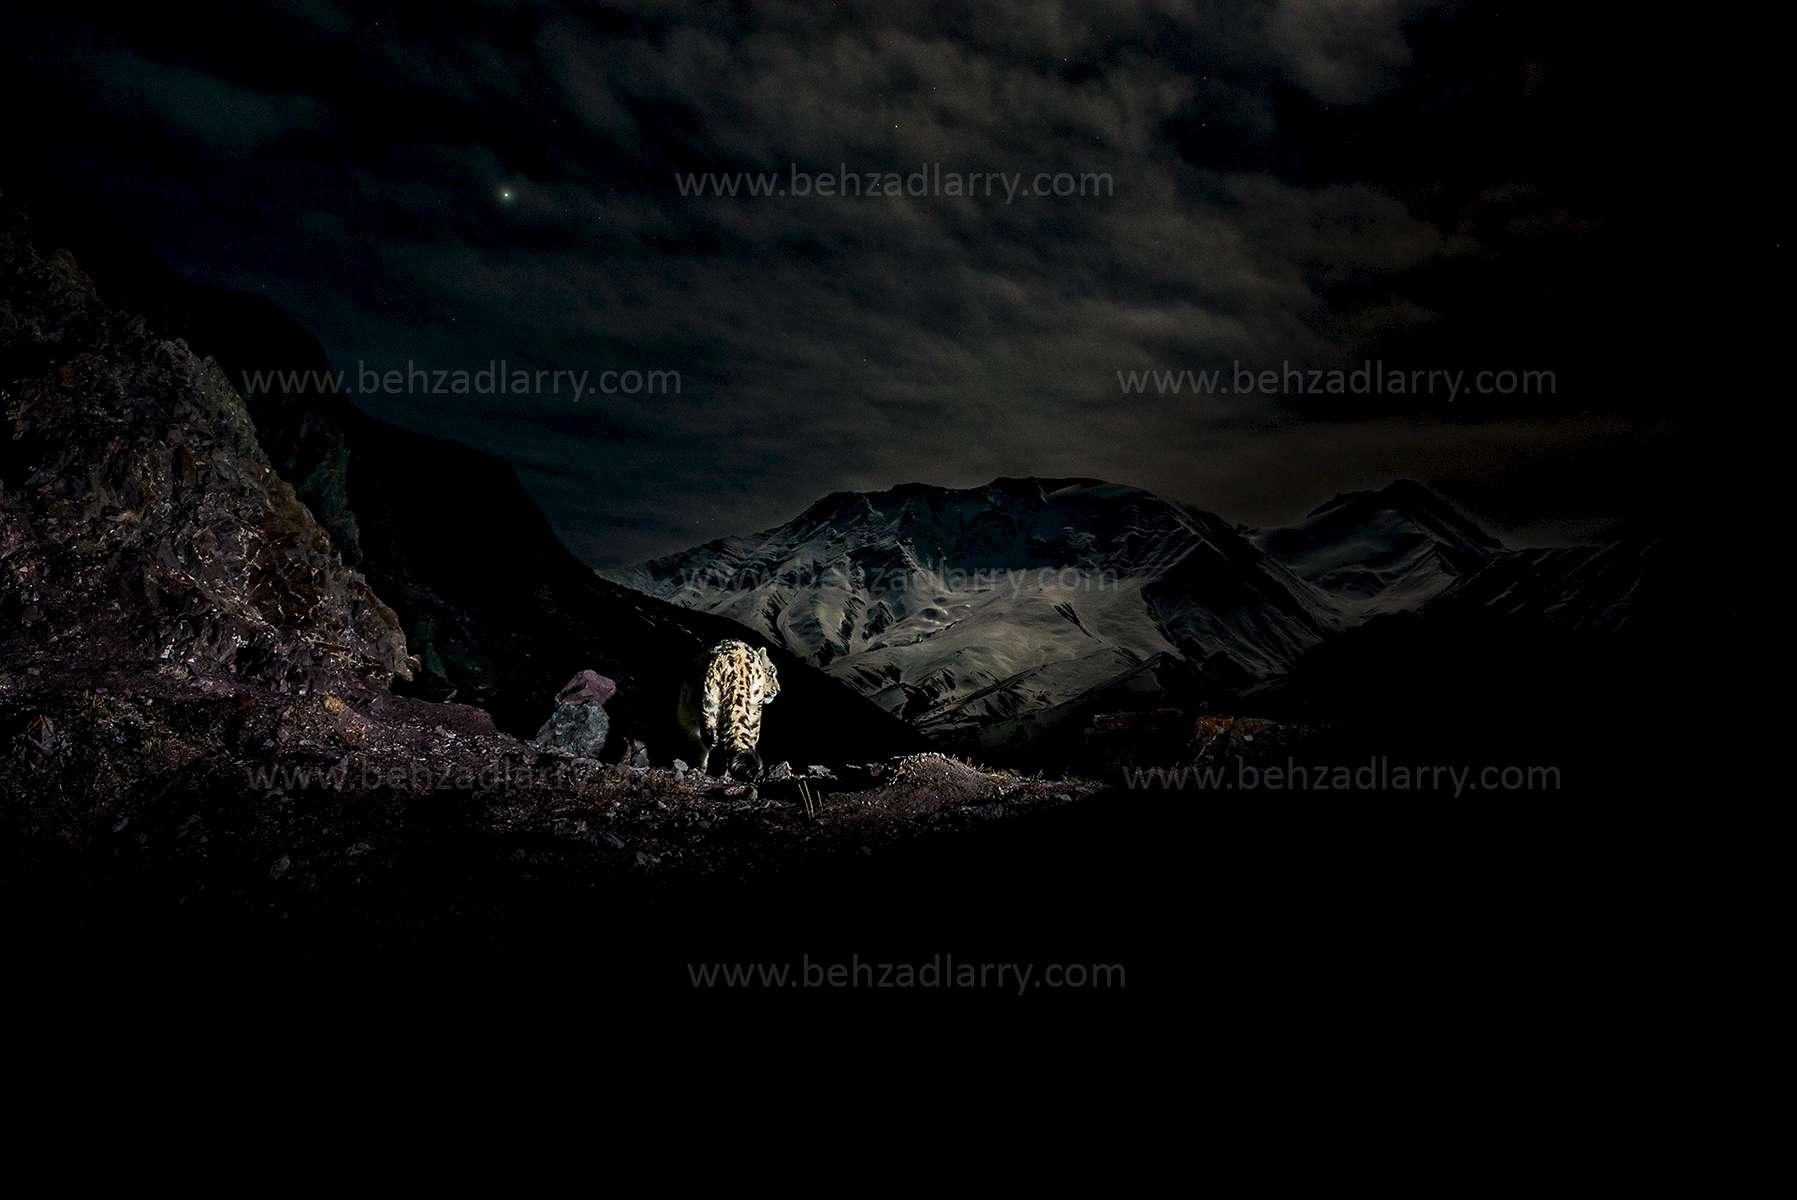 moonlit-landscape-snowleopard-behzadlarry